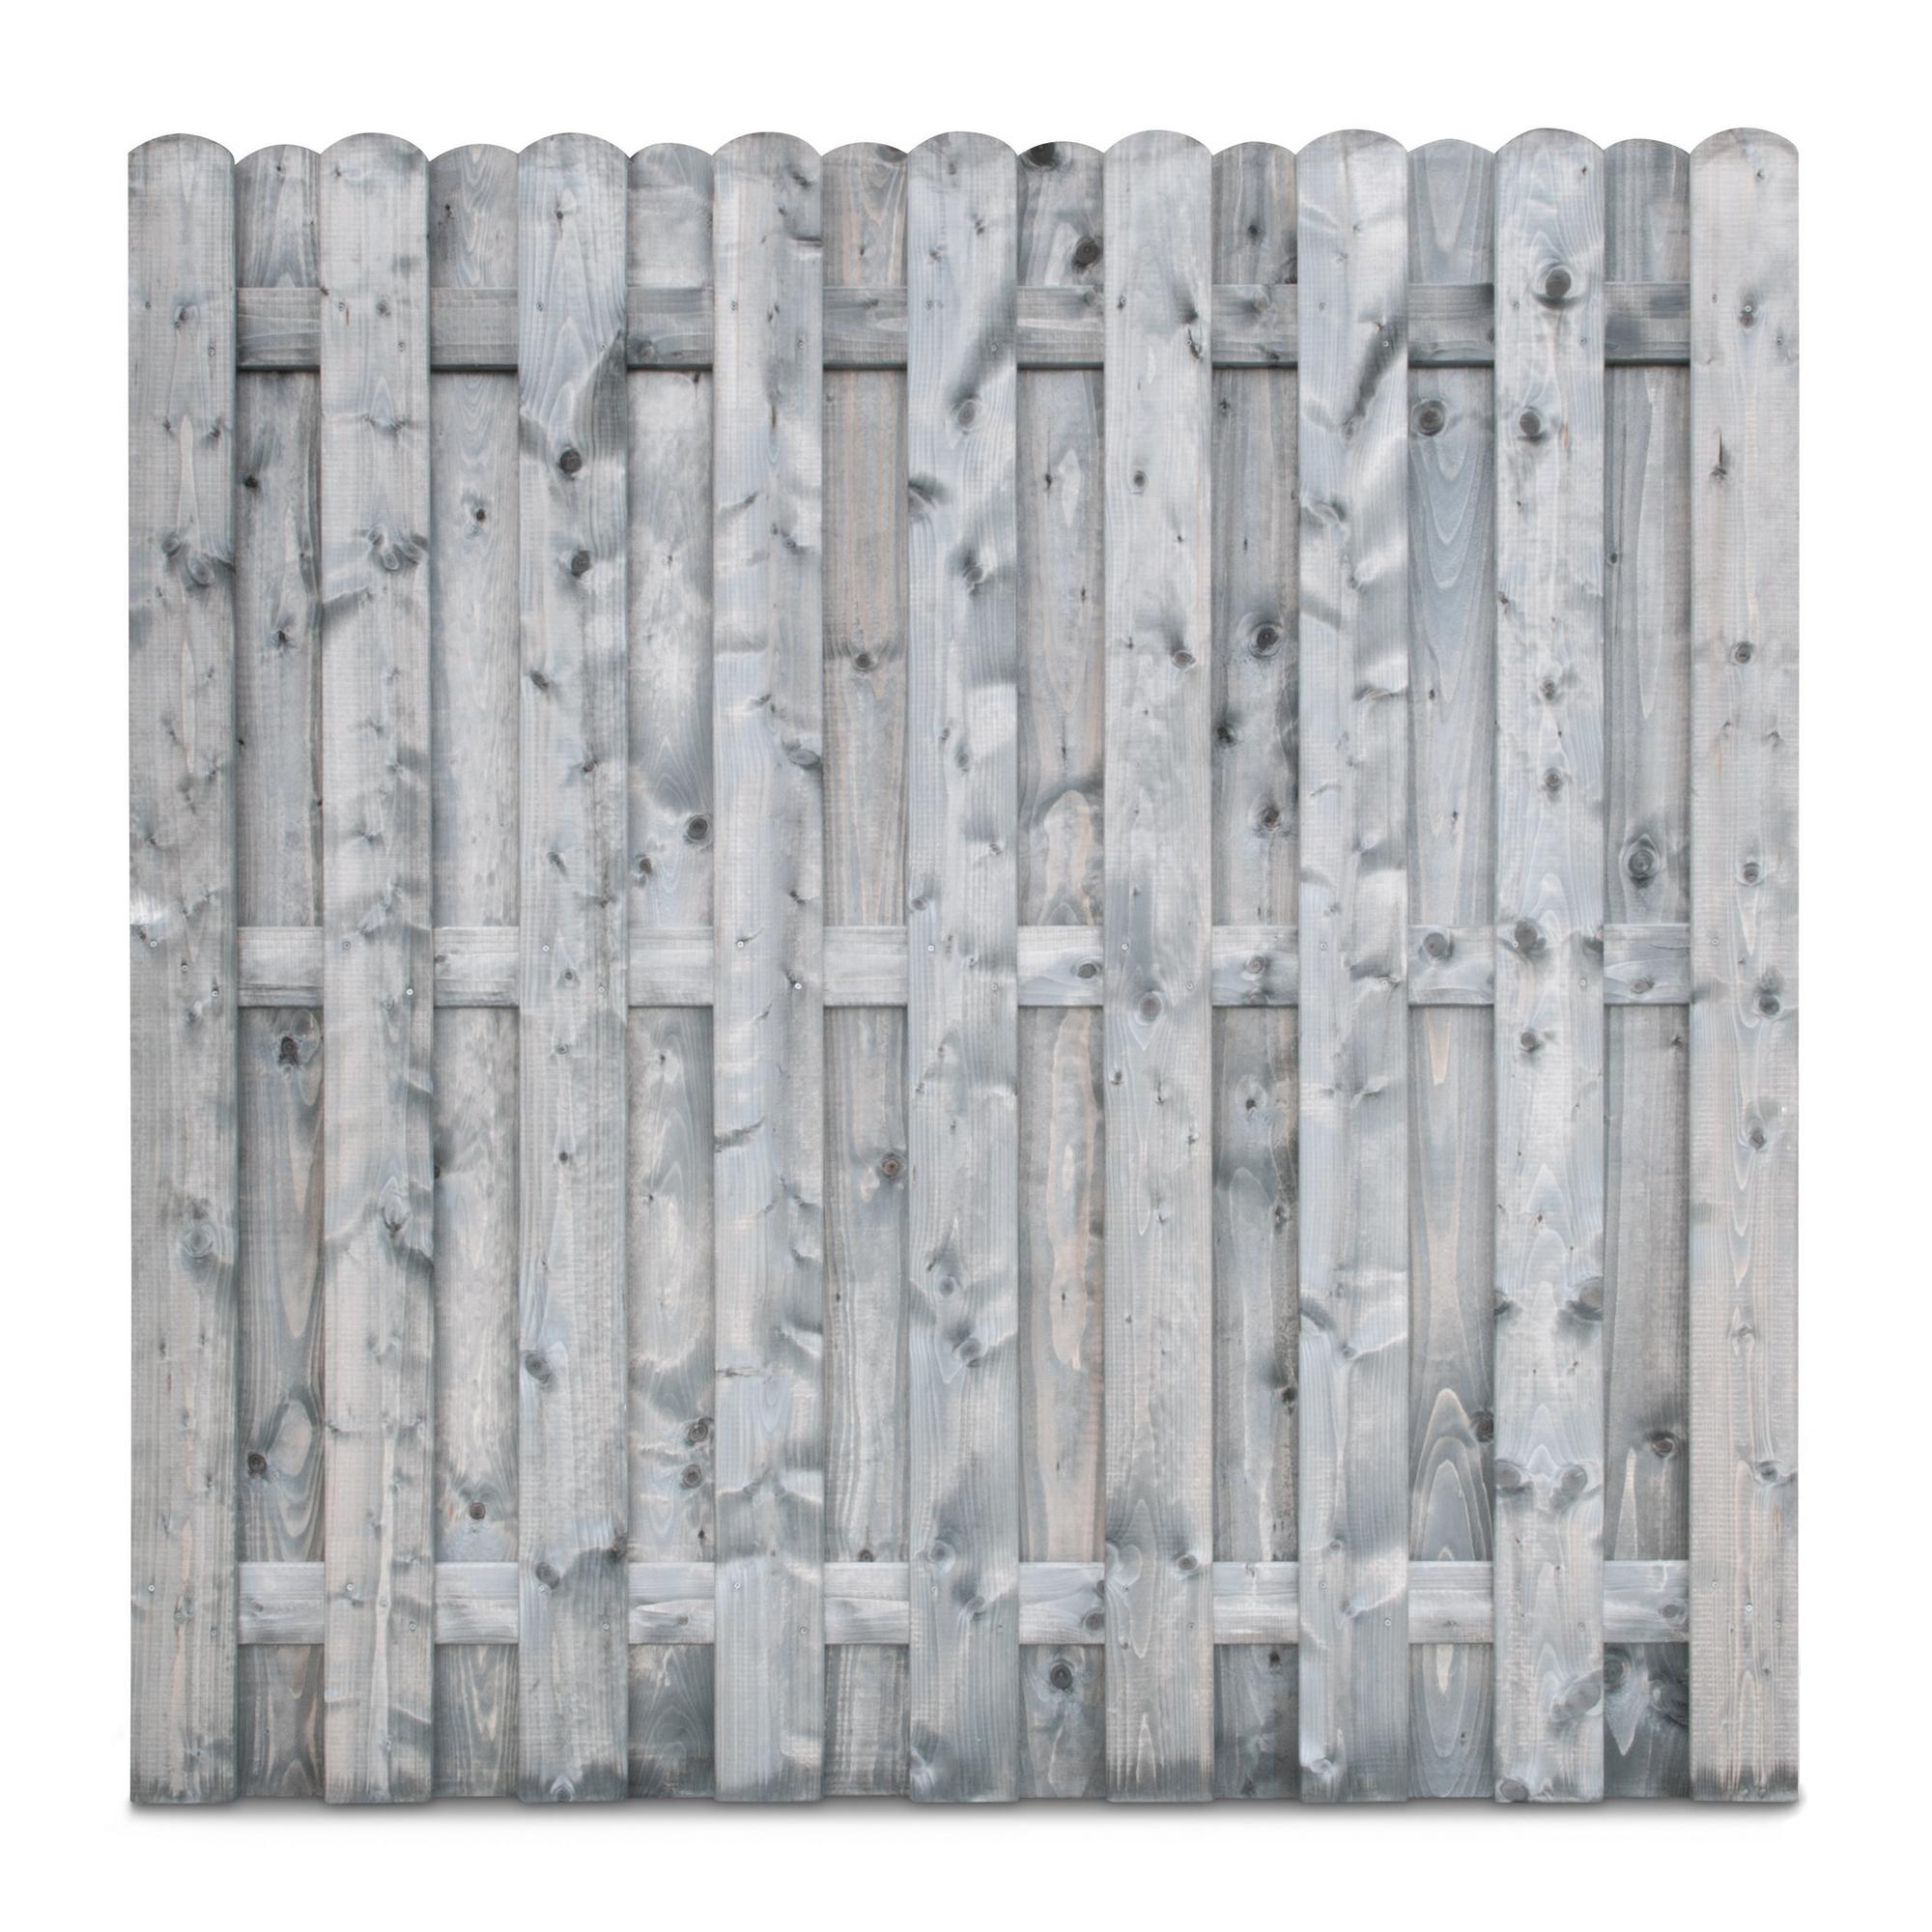 Bohlenzaun Nadelholz Grau Lasiert 180 X 180 Cm ǀ Toom Baumarkt